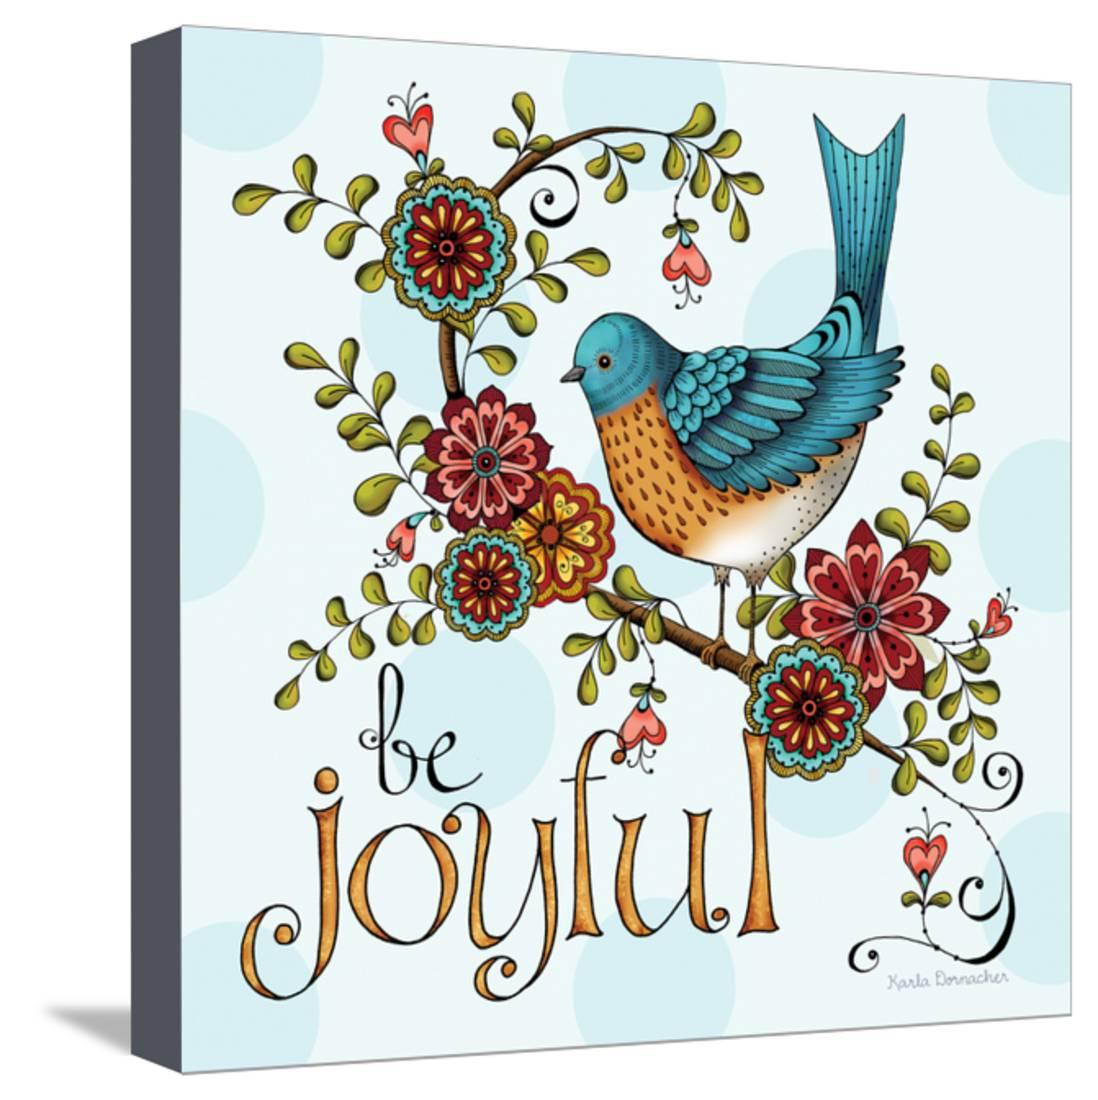 Be Joyful Stretched Canvas Print Wall Art By Karla Dornacher